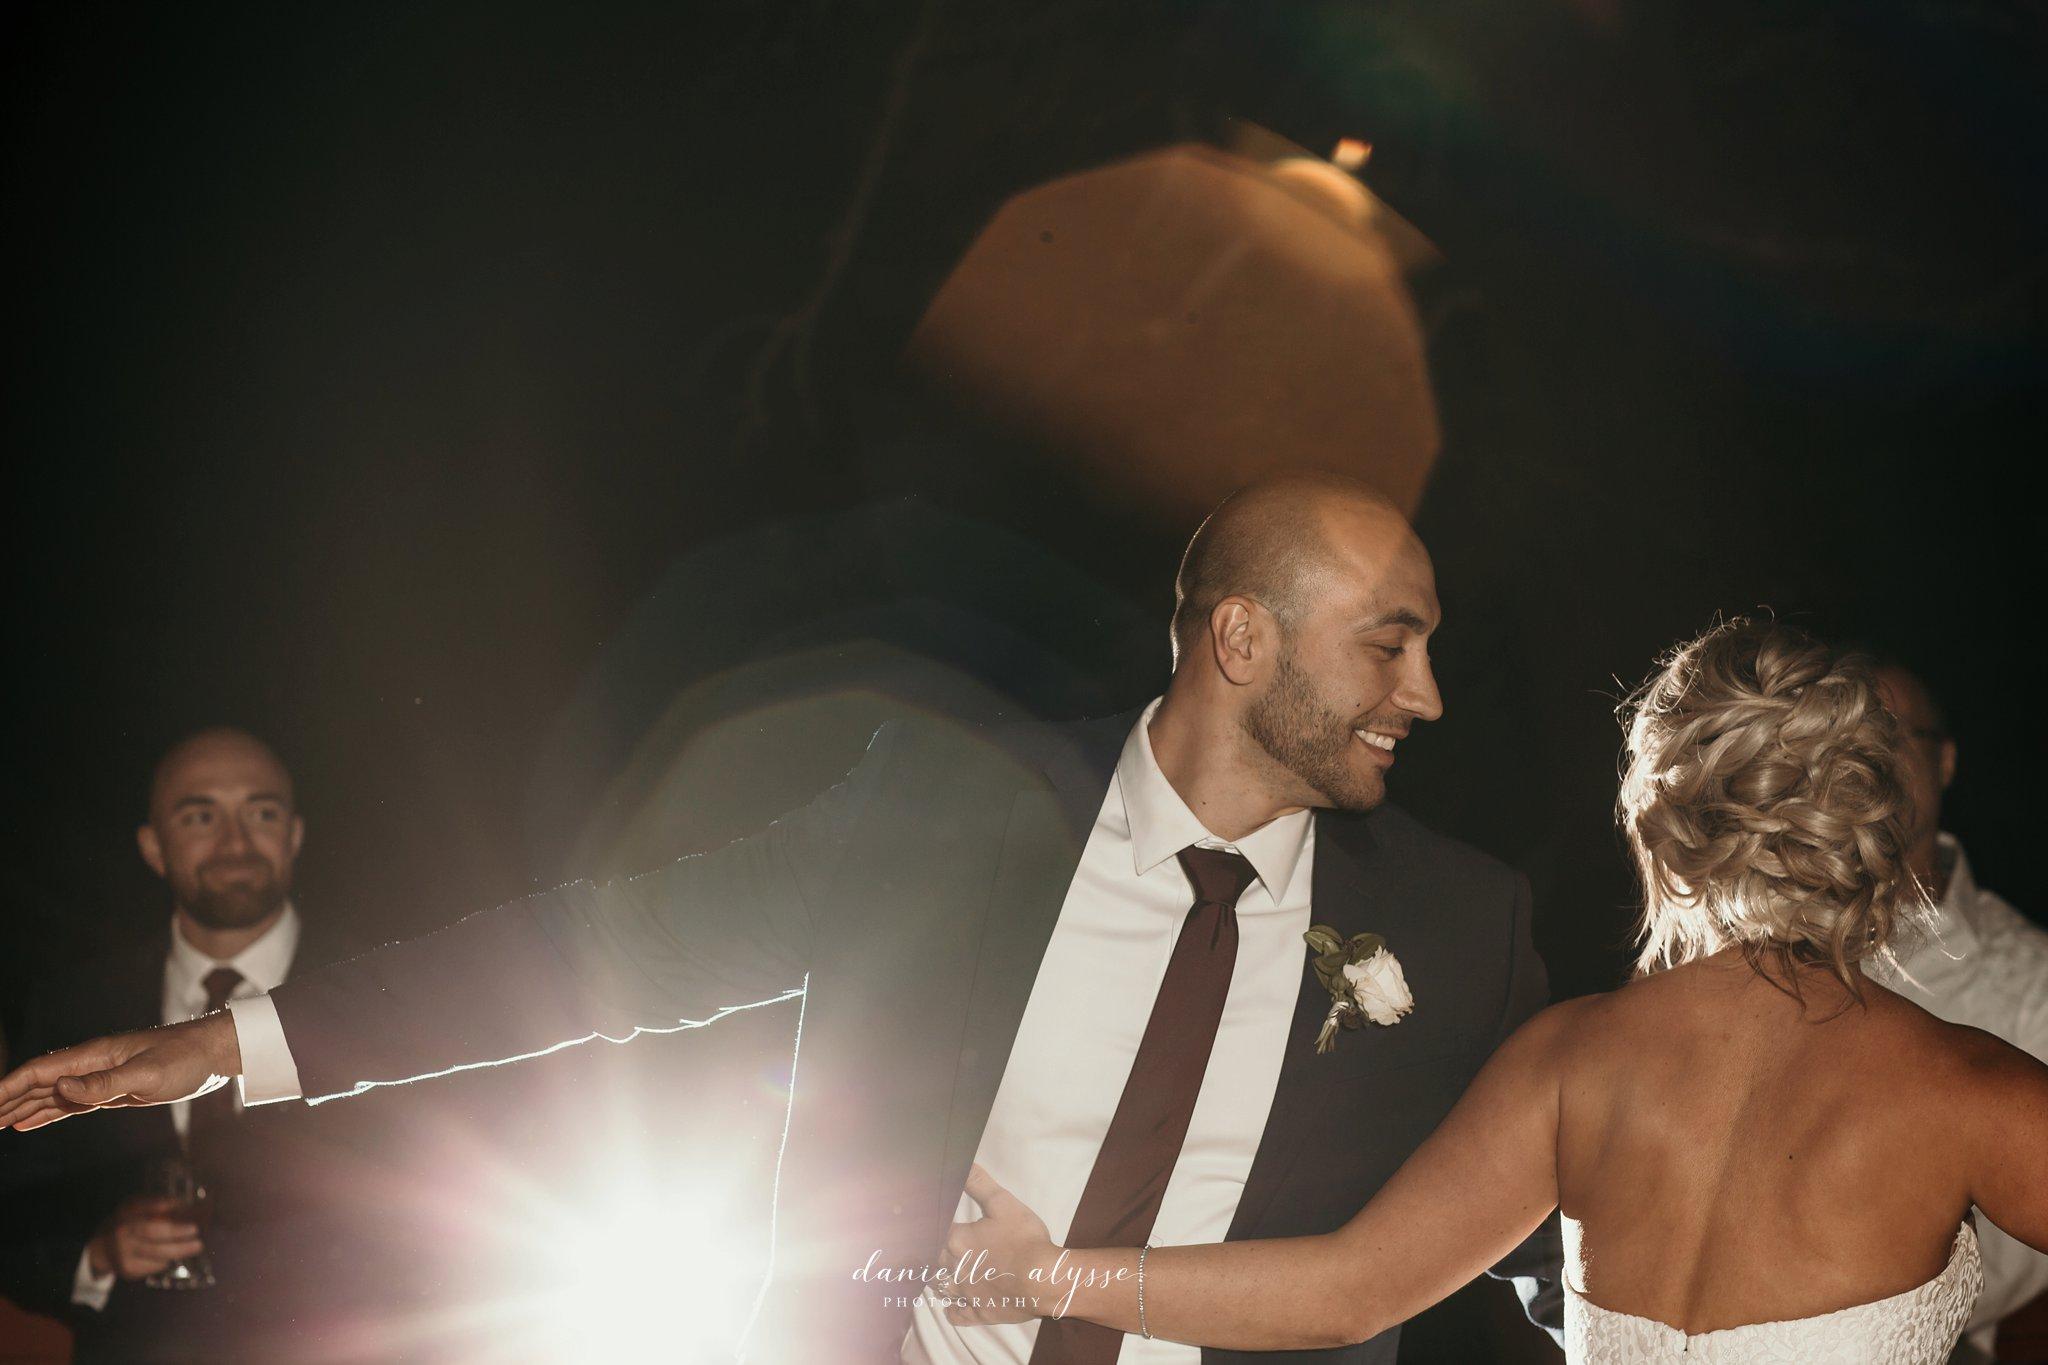 180831_wedding_stephanie_heavenly_south_lake_tahoe_danielle_alysse_photography_destination_blog_1177_WEB.jpg